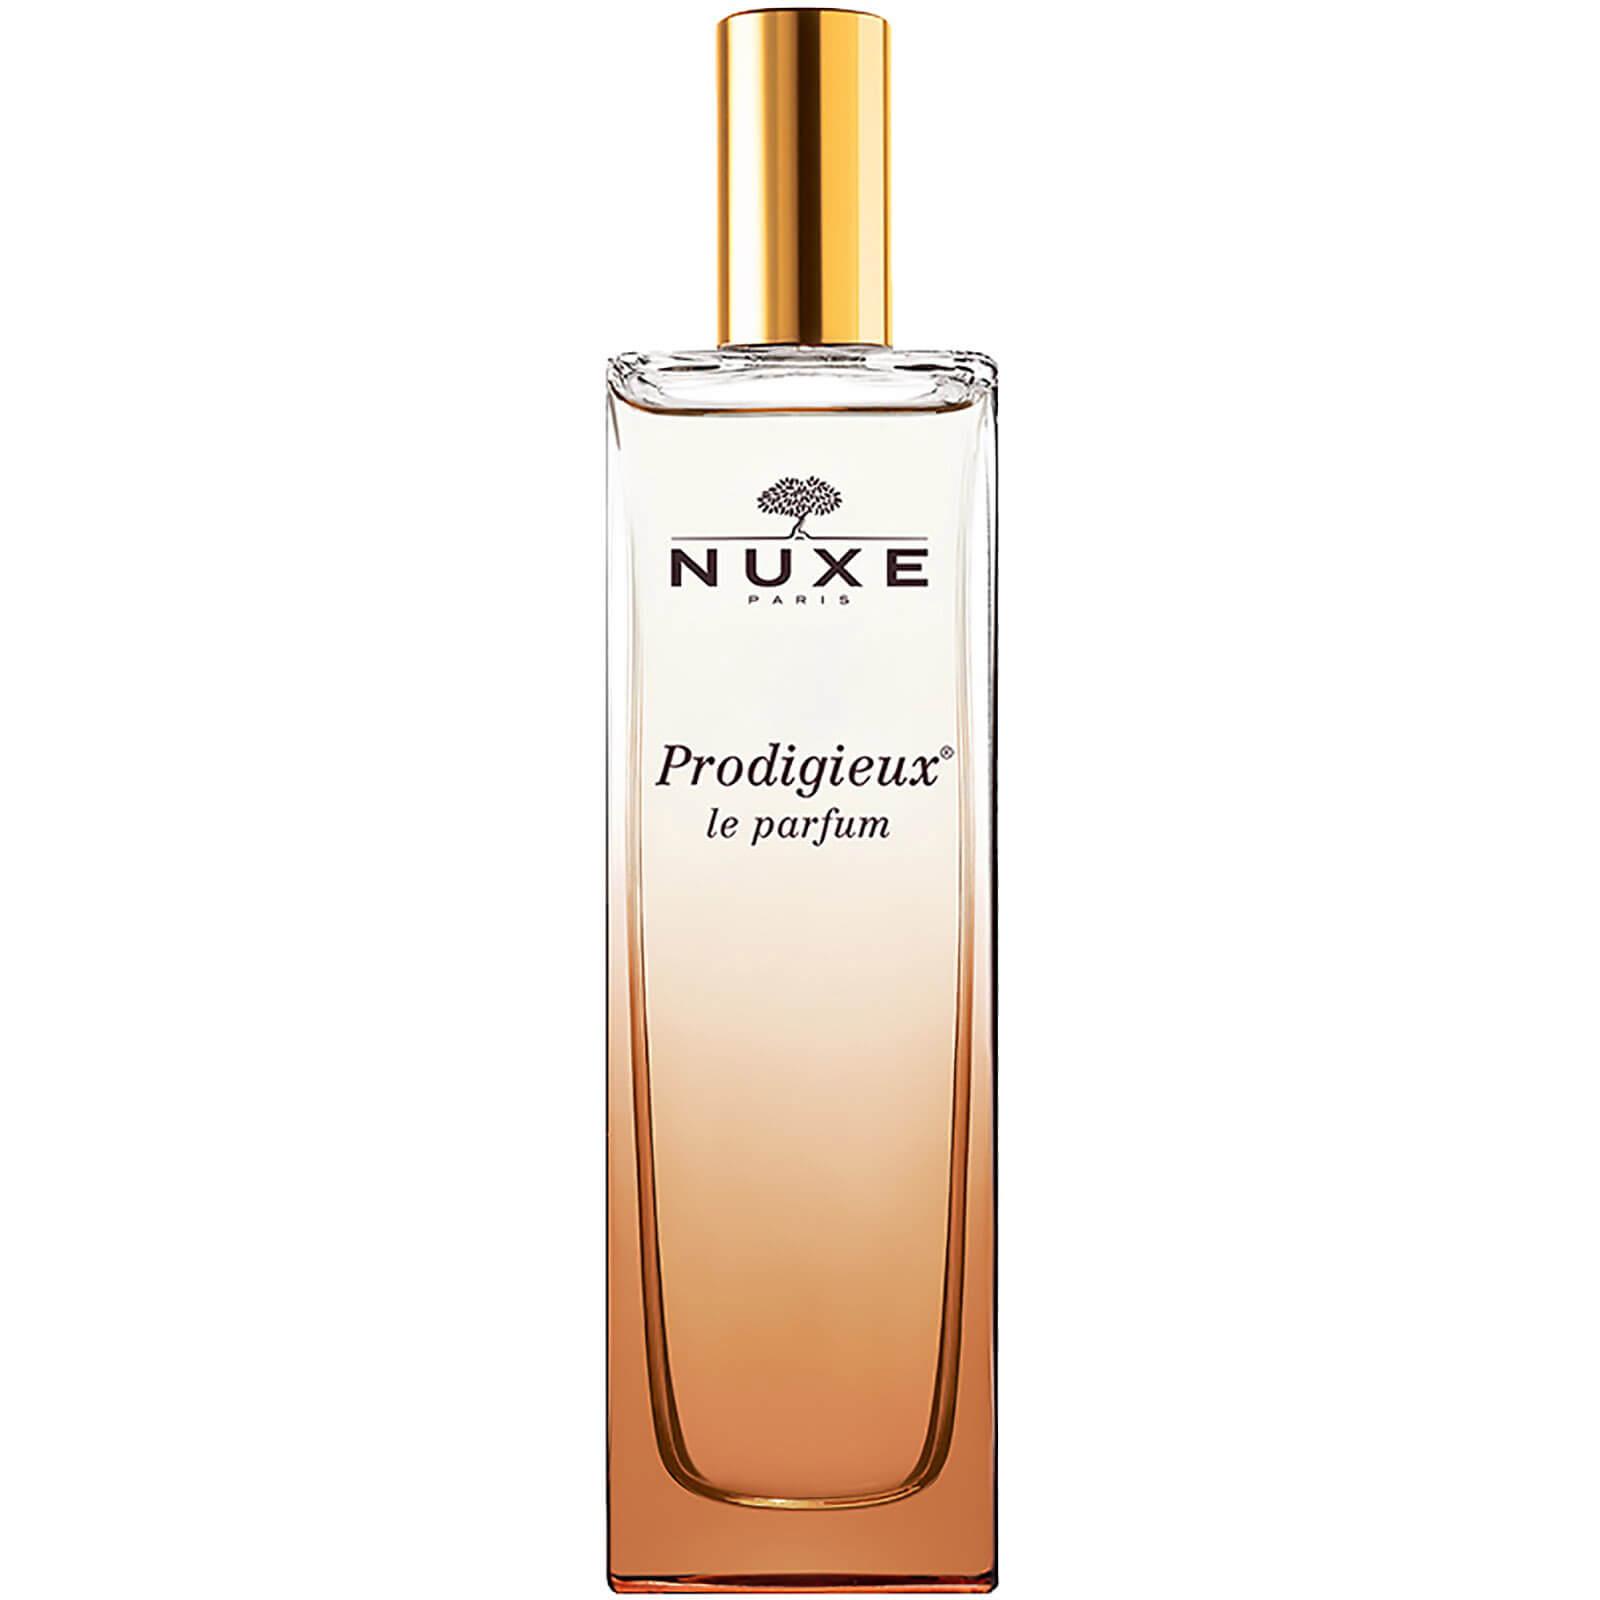 Nuxe Perfume 50ml Free Shipping Lookfantastic